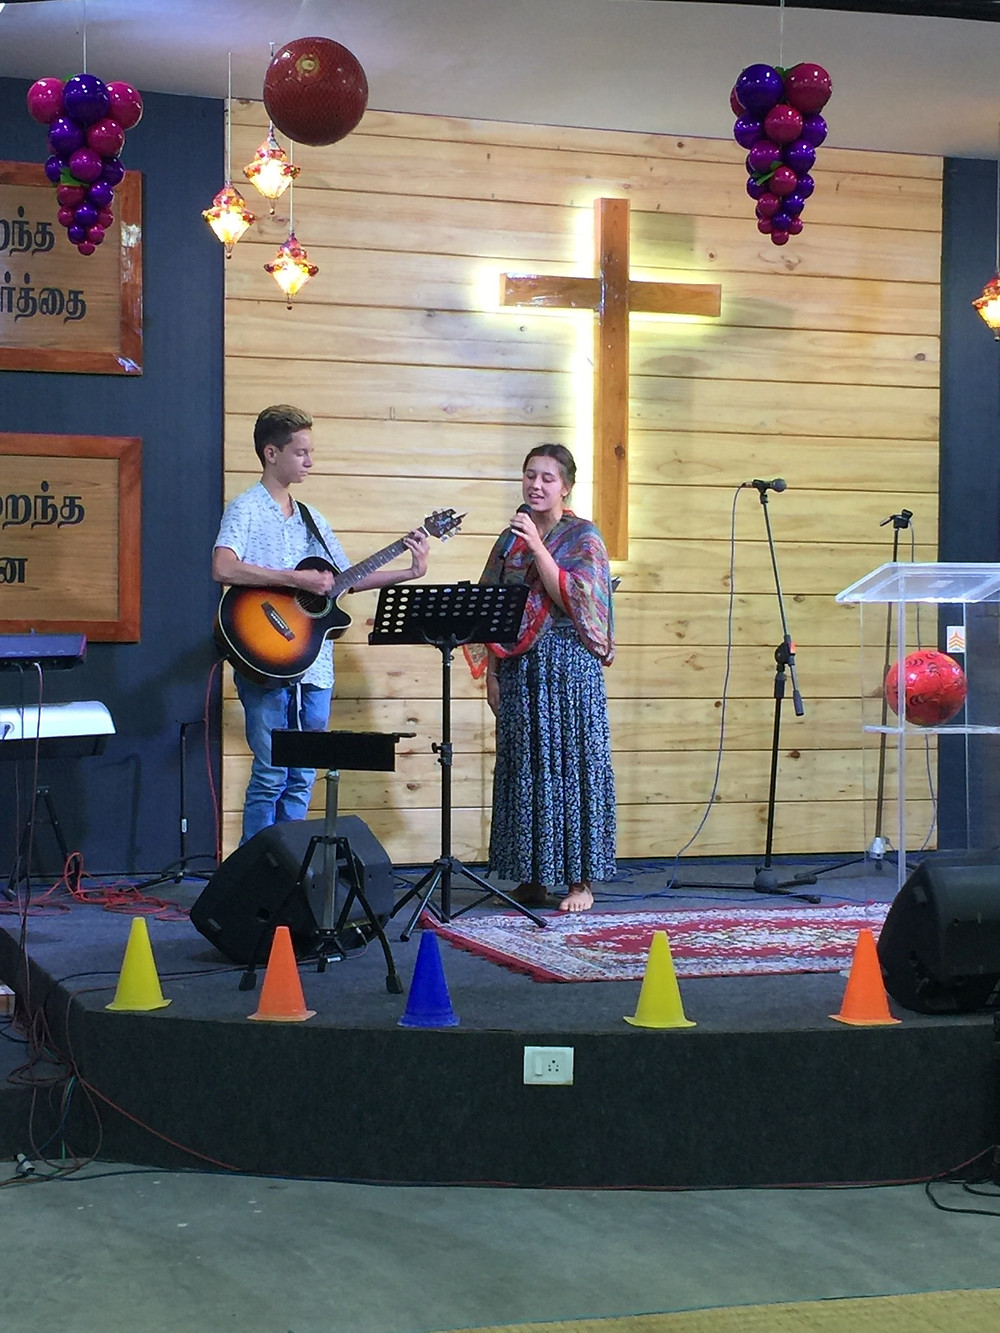 Claire & Elijah leading worship